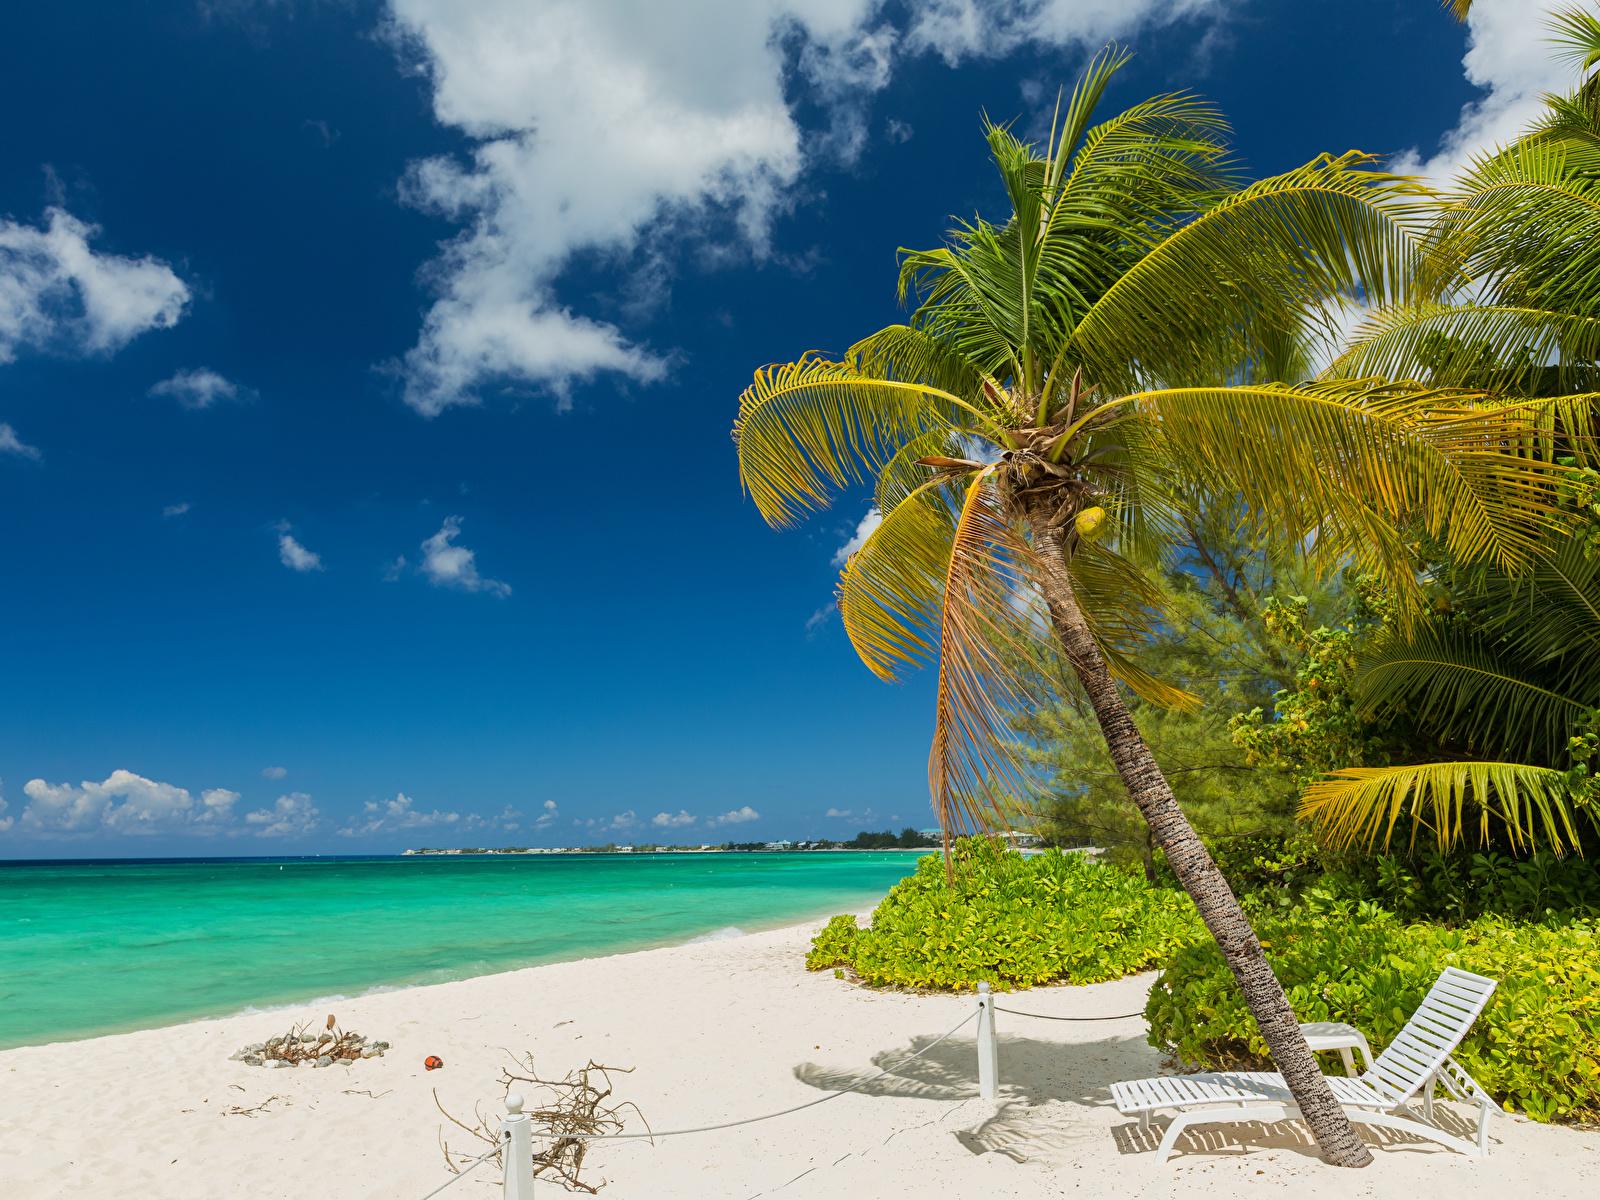 Wallpaper Grand Cayman Nature Sky Palms Tropics Coast Sunlounger Clouds 1600x1200 palm trees